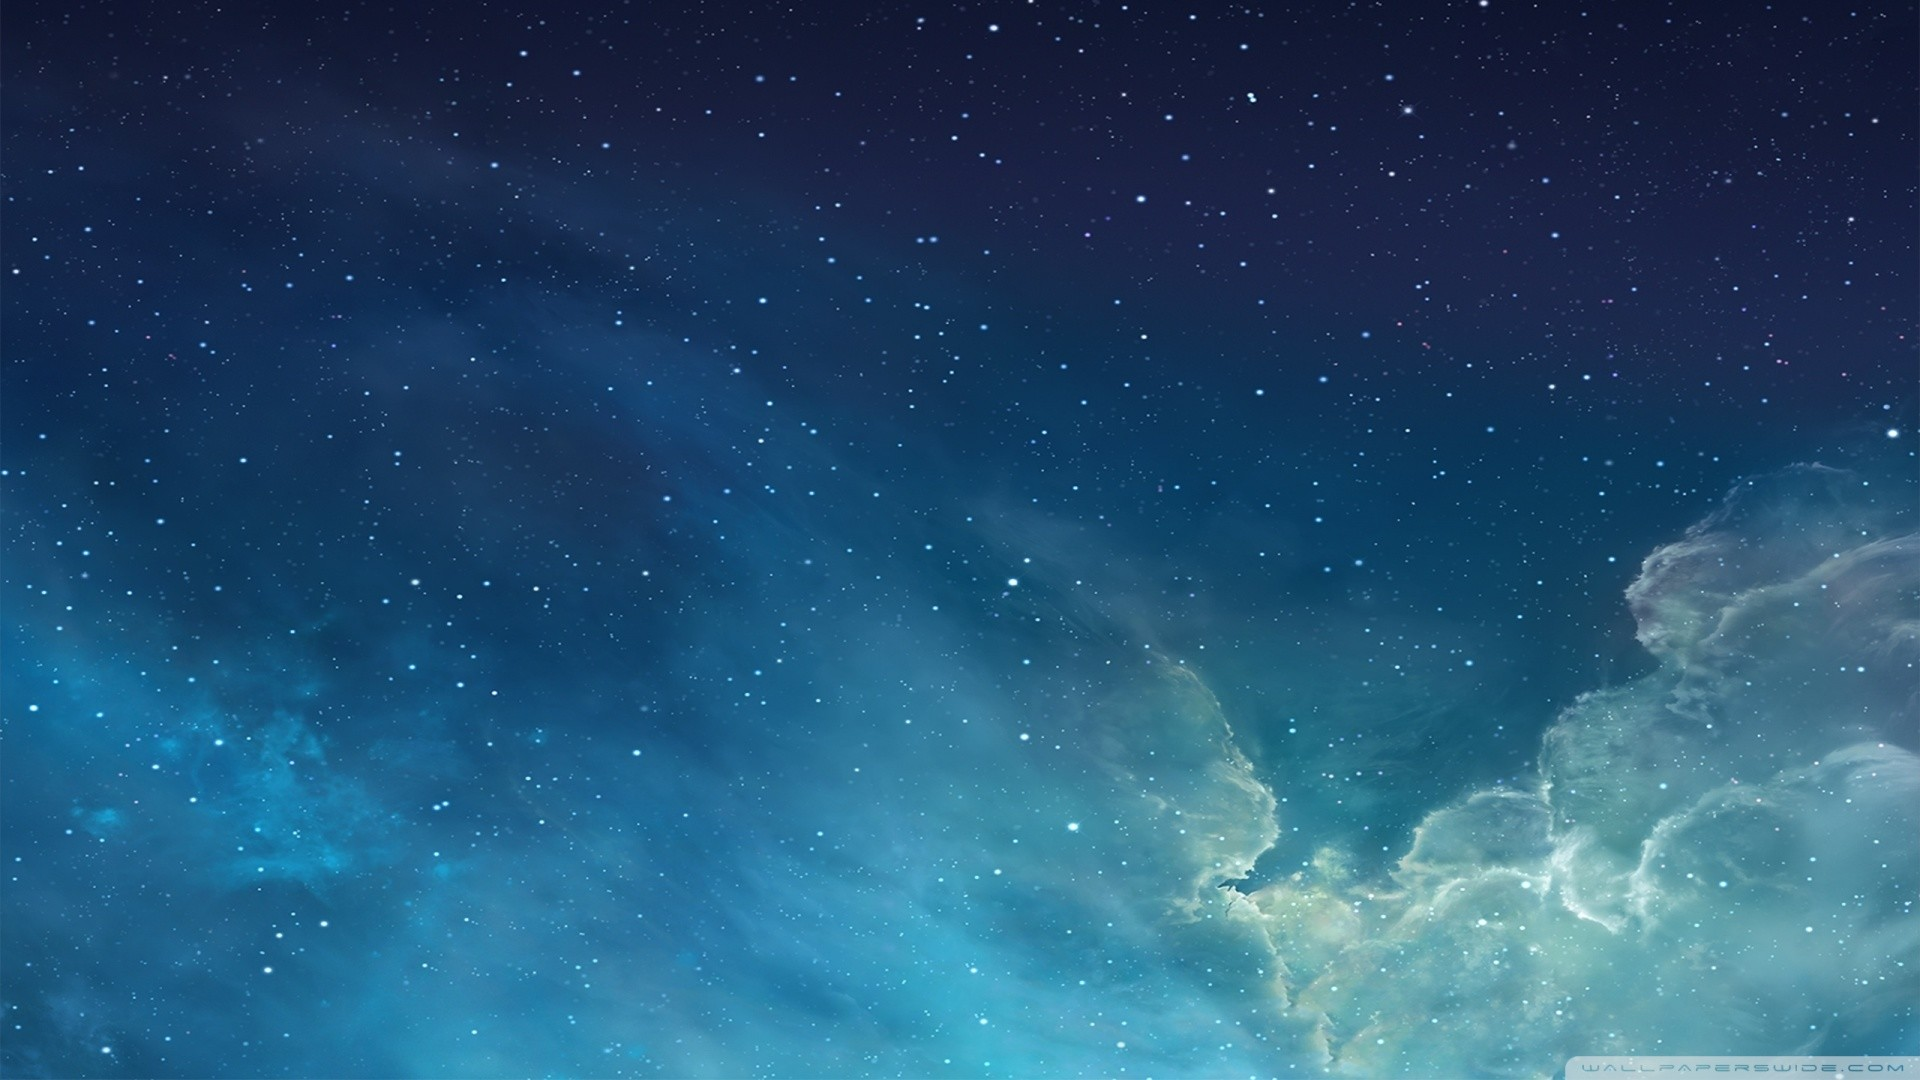 iOS 7 Galaxy HD desktop wallpaper : High Definition : Fullscreen